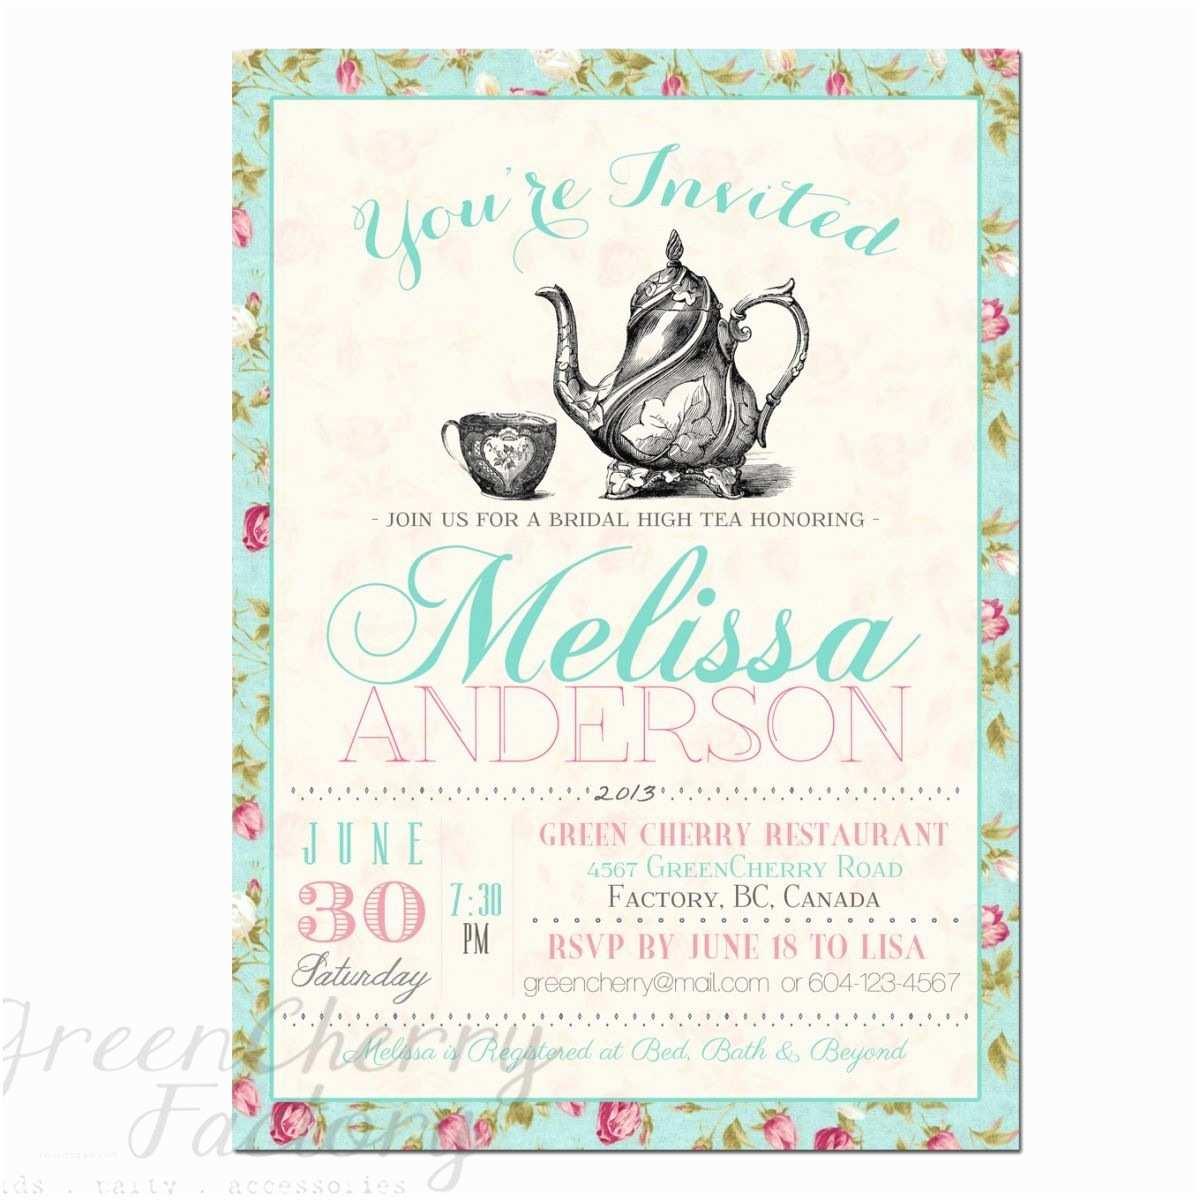 Wedding Tea Invitations Tea Party Invitation Templates to Print